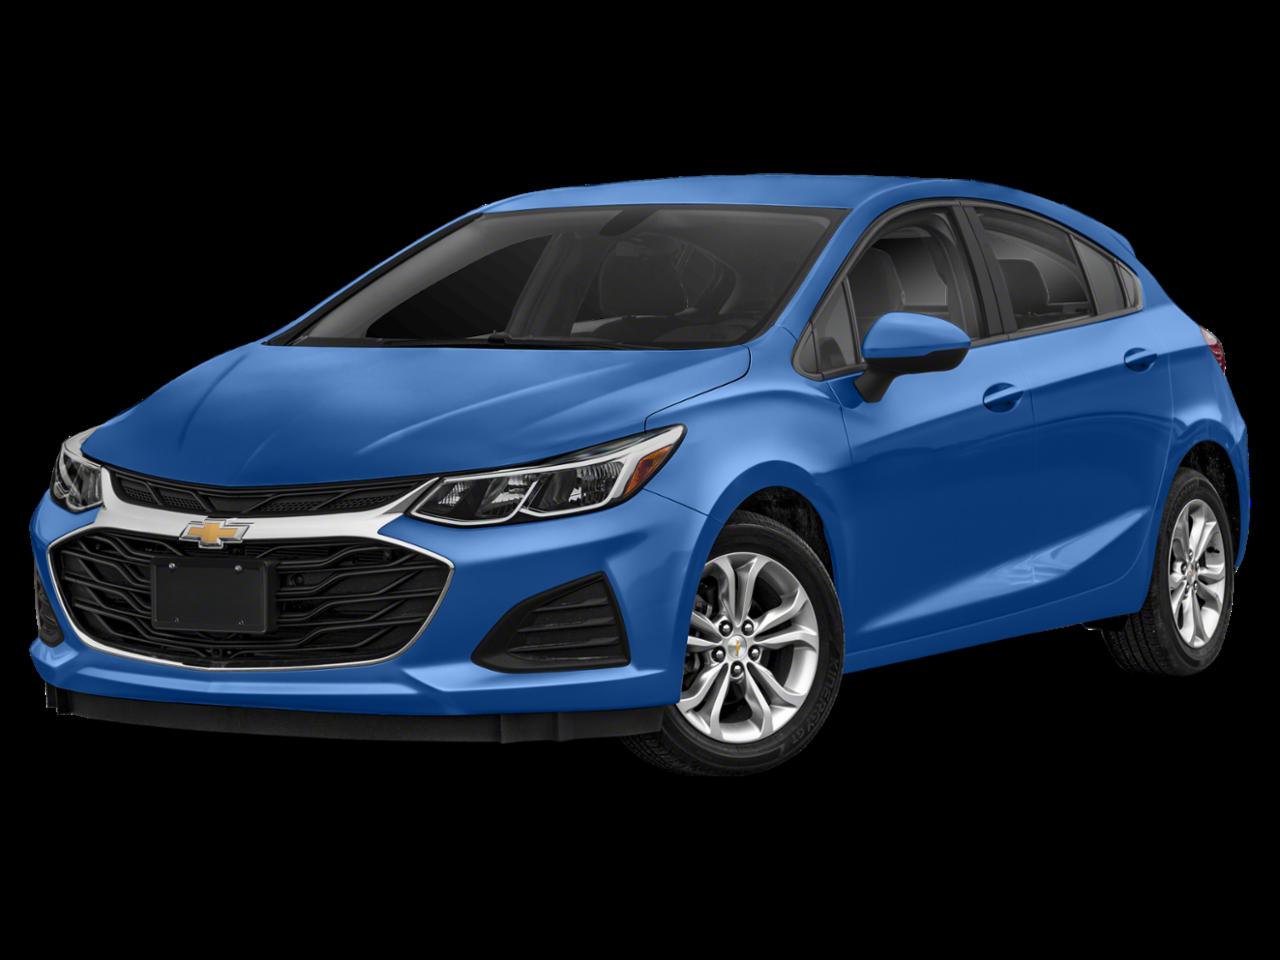 5 Star Review for Al Serra Chevrolet from FENTON, MI